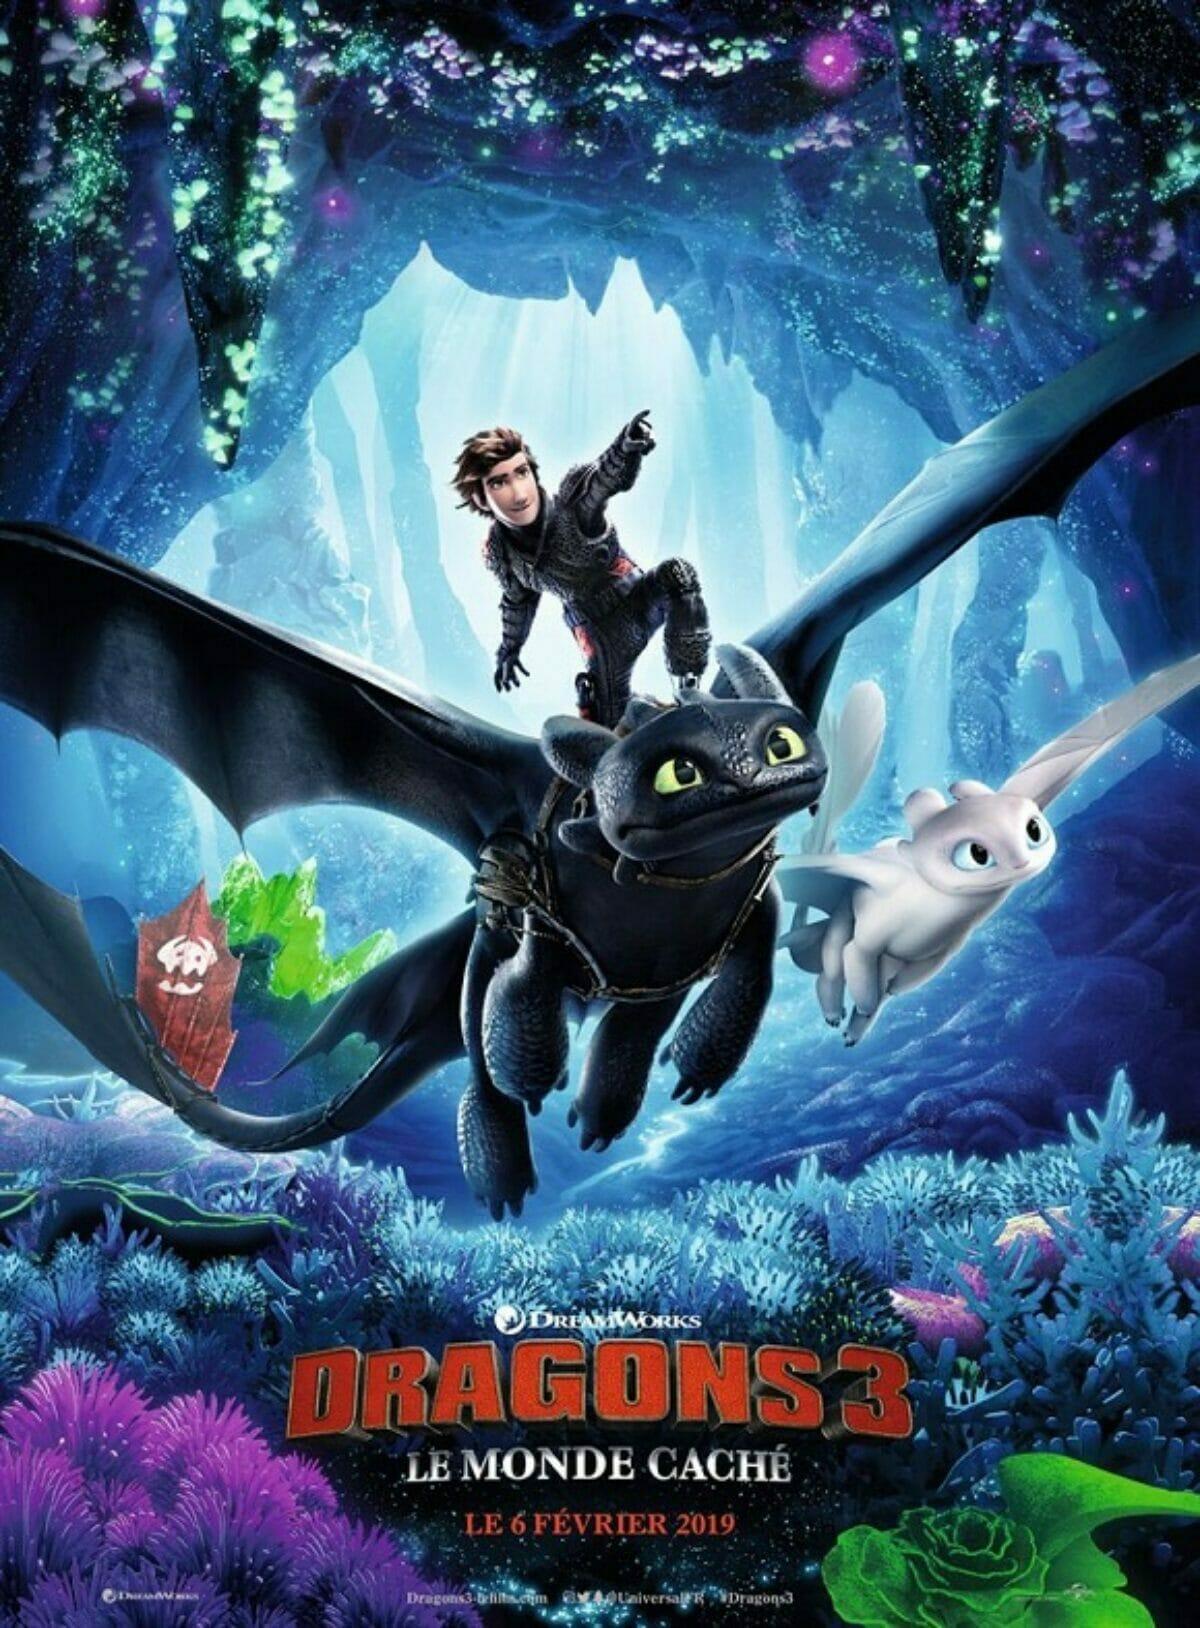 dragons-3-poster